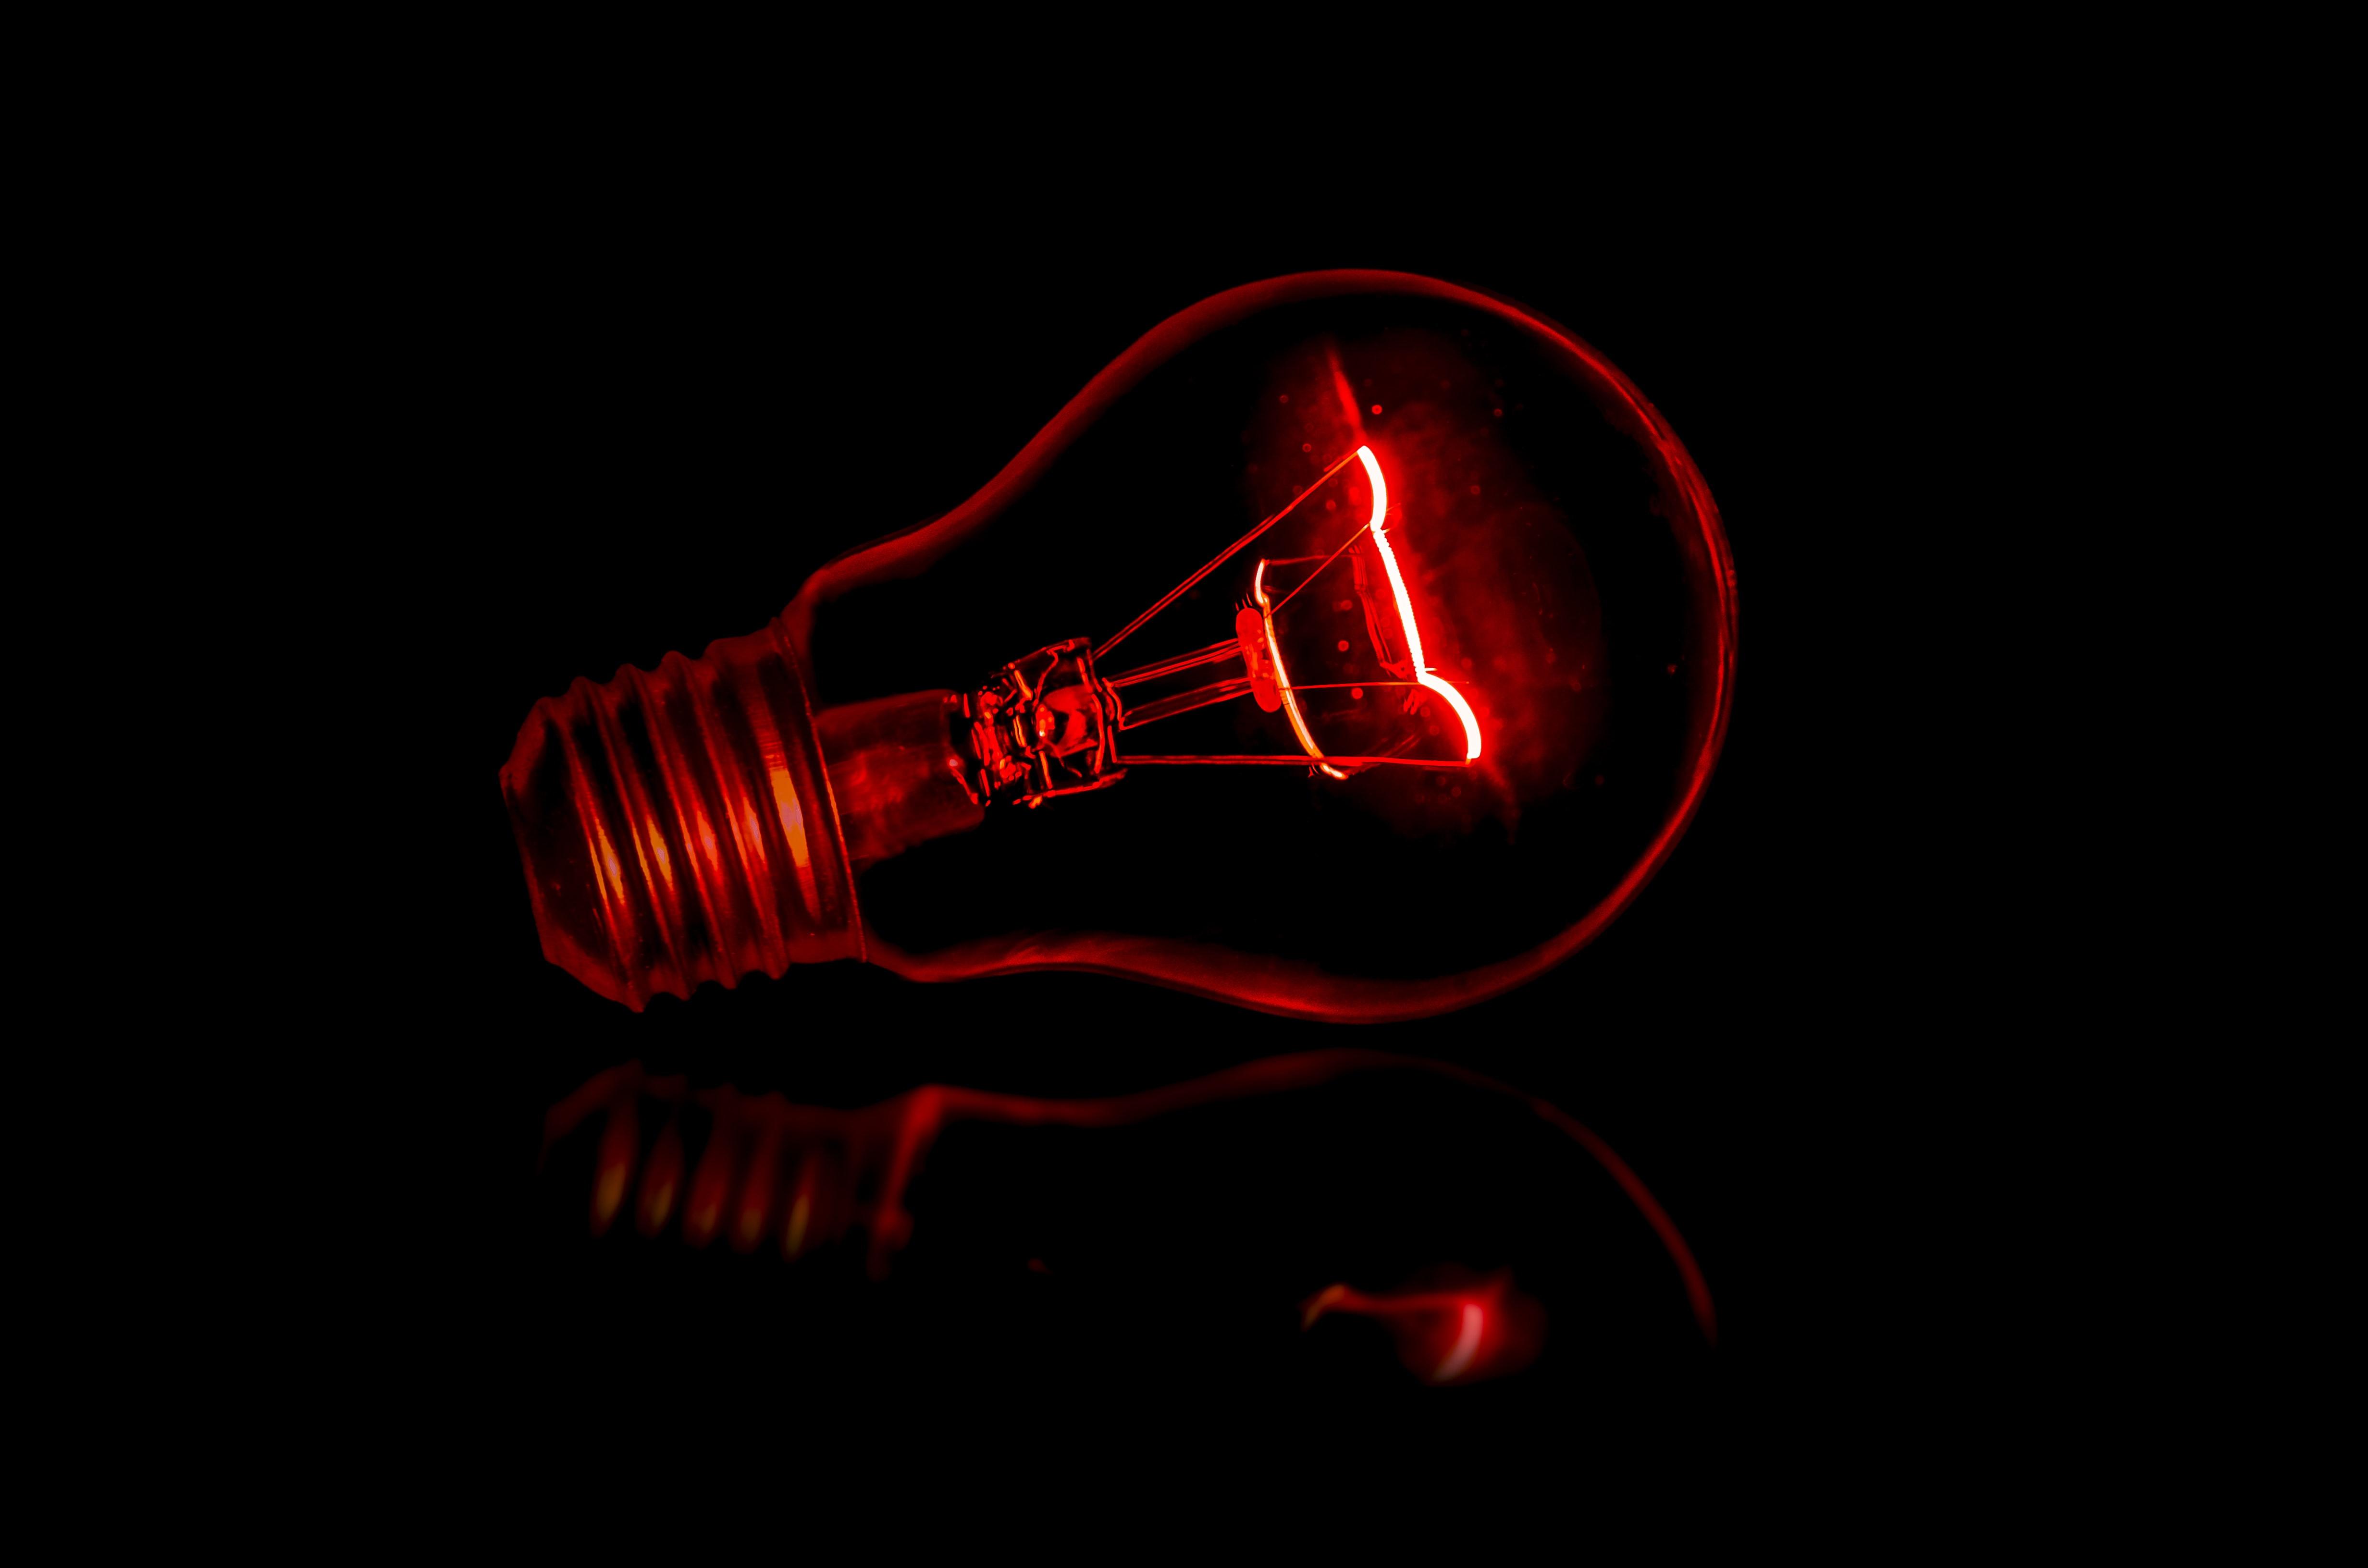 Red light bulb in the dark.